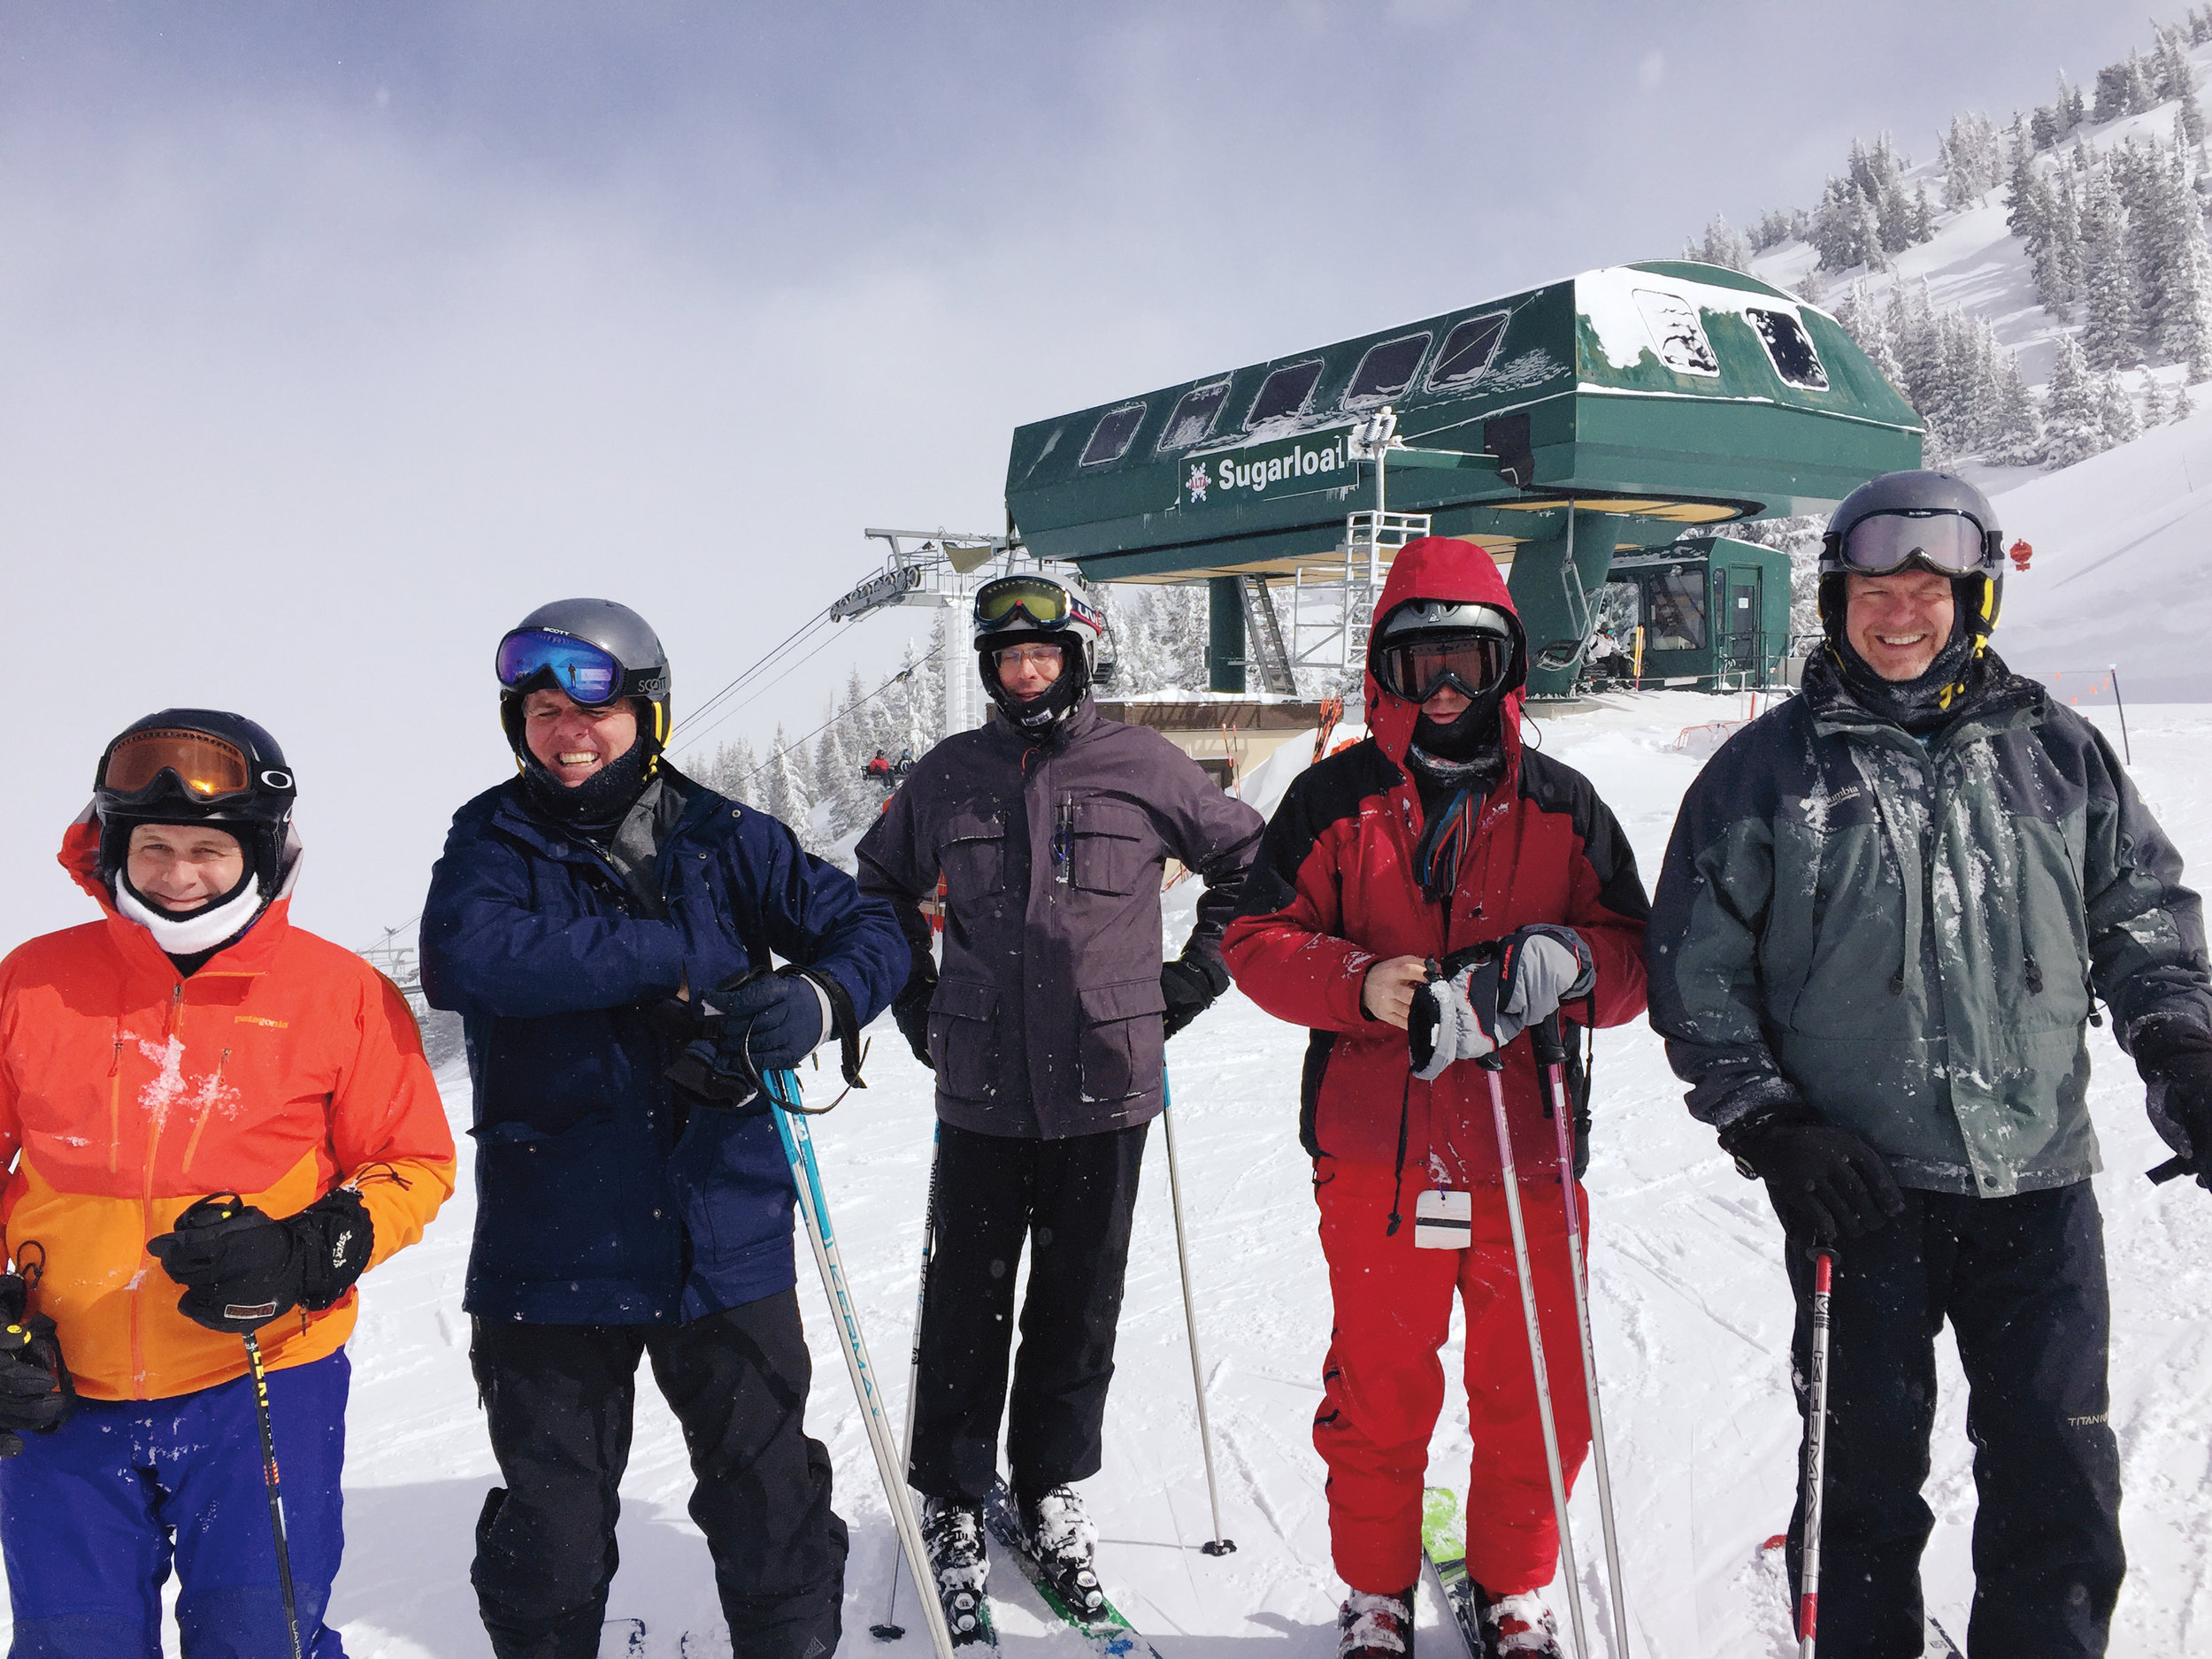 1980 Guys Skiing Sugarloaf.jpg